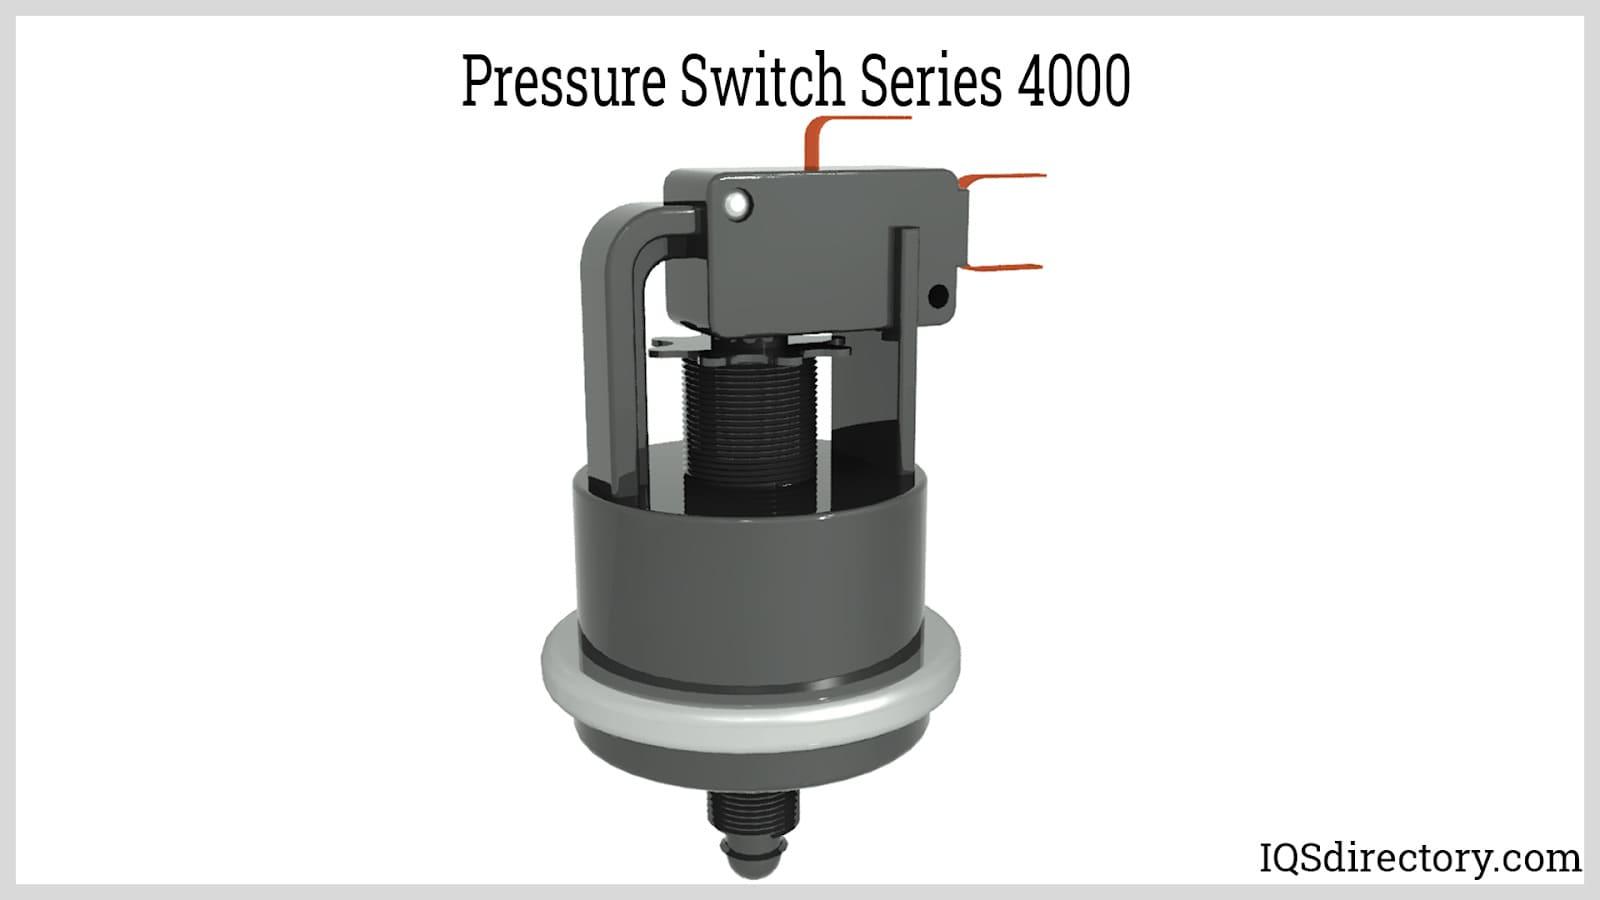 Pressure Switch Series 4000